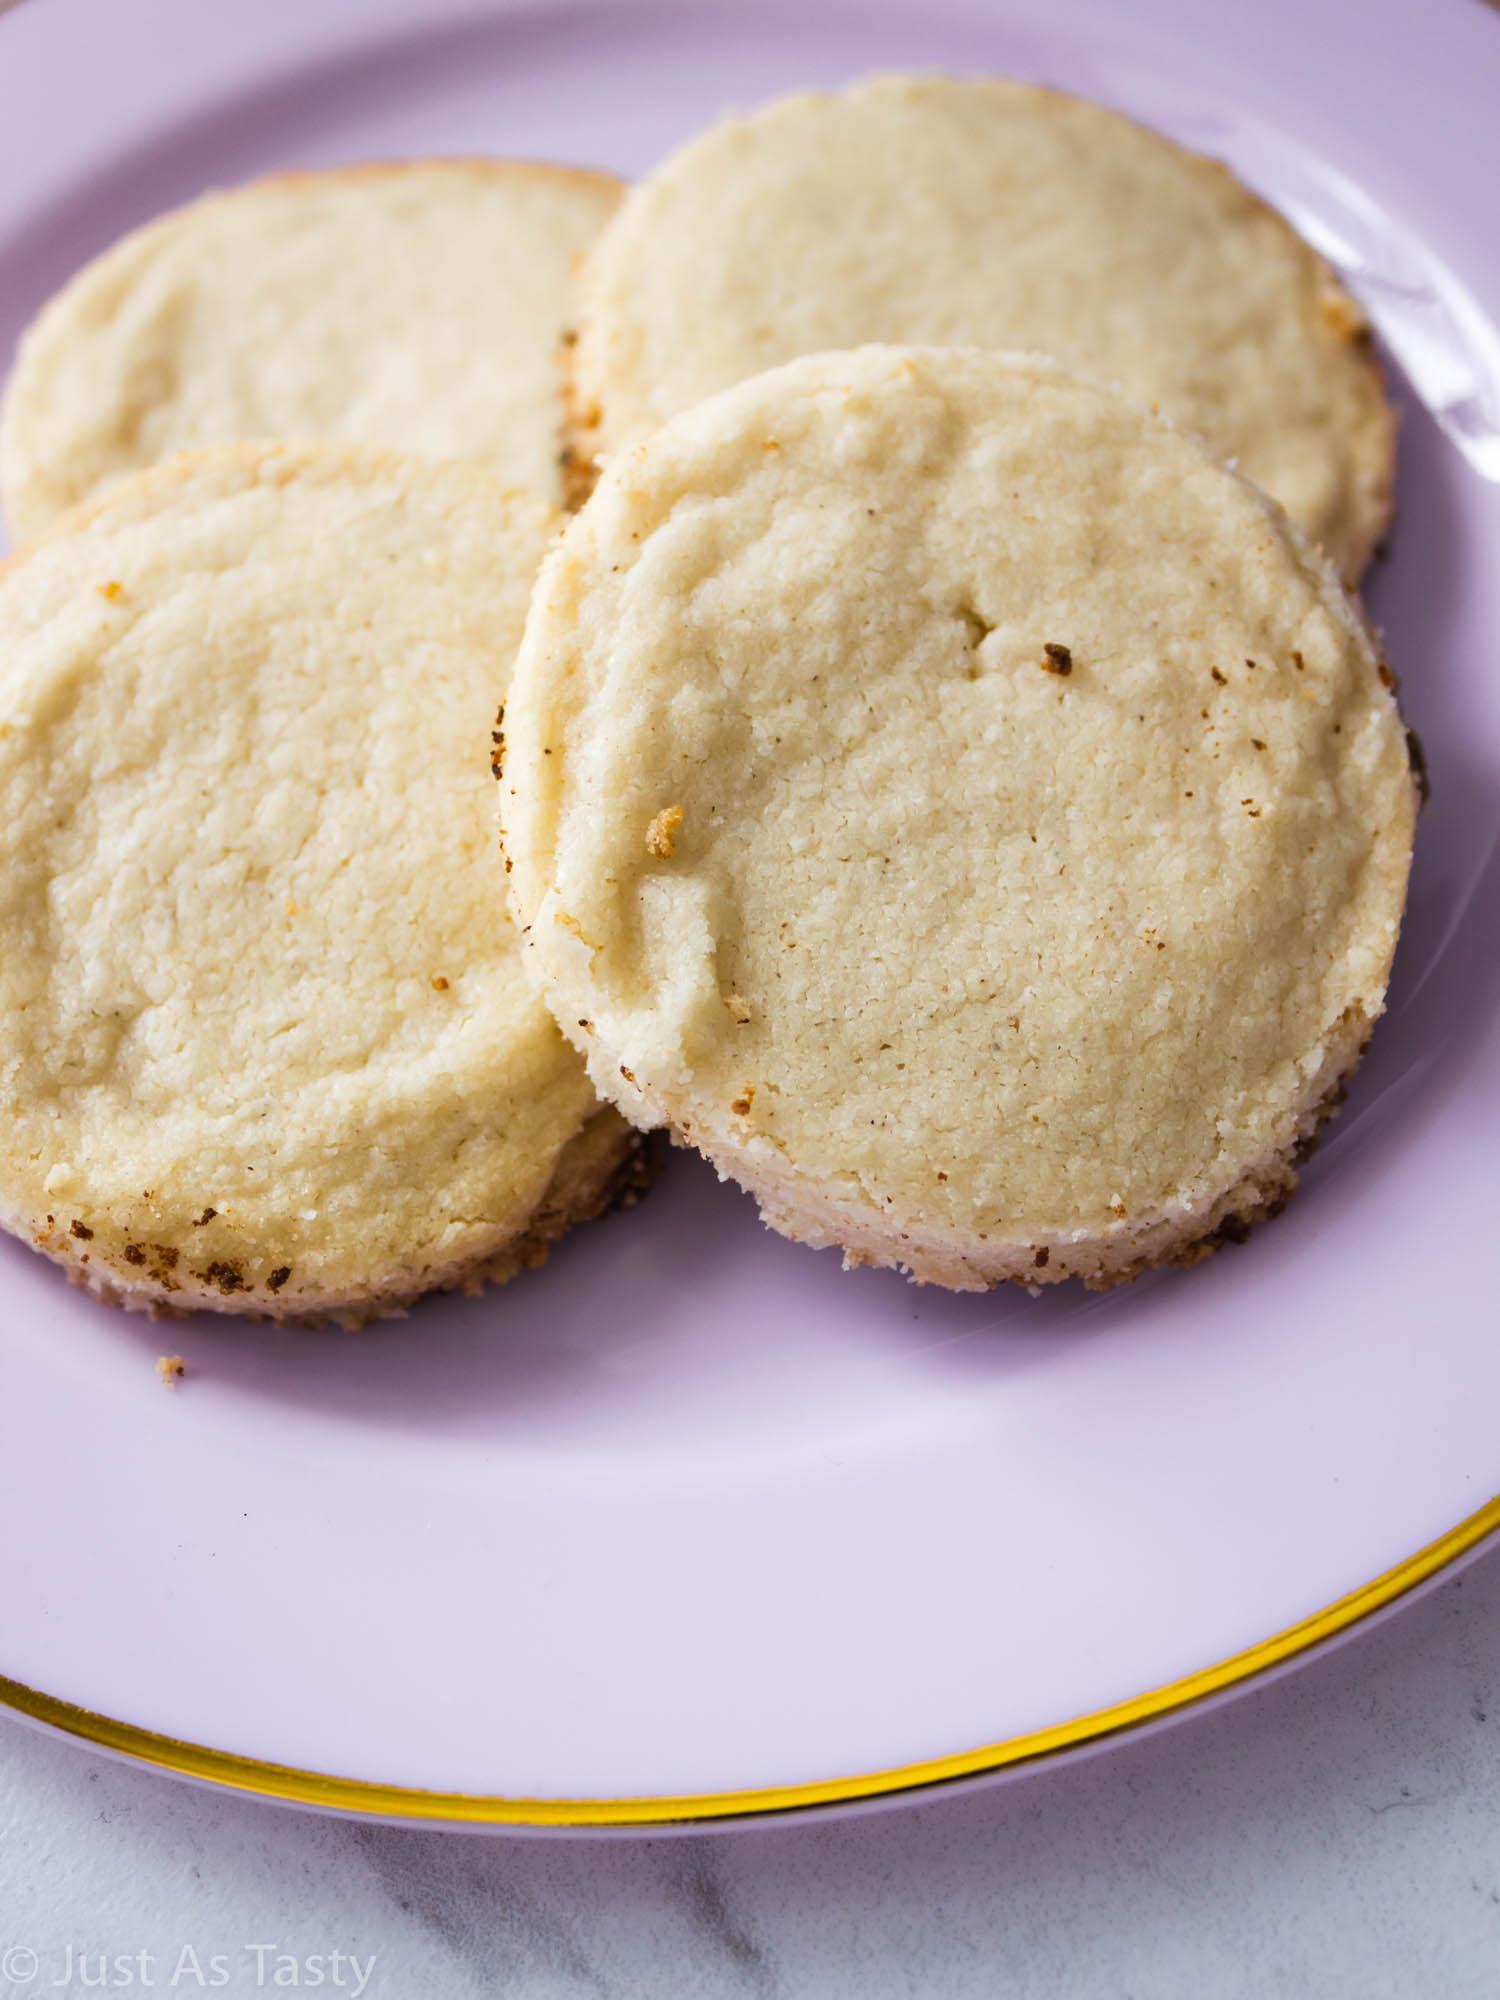 Lavender shortbread cookies on a light purple plate.